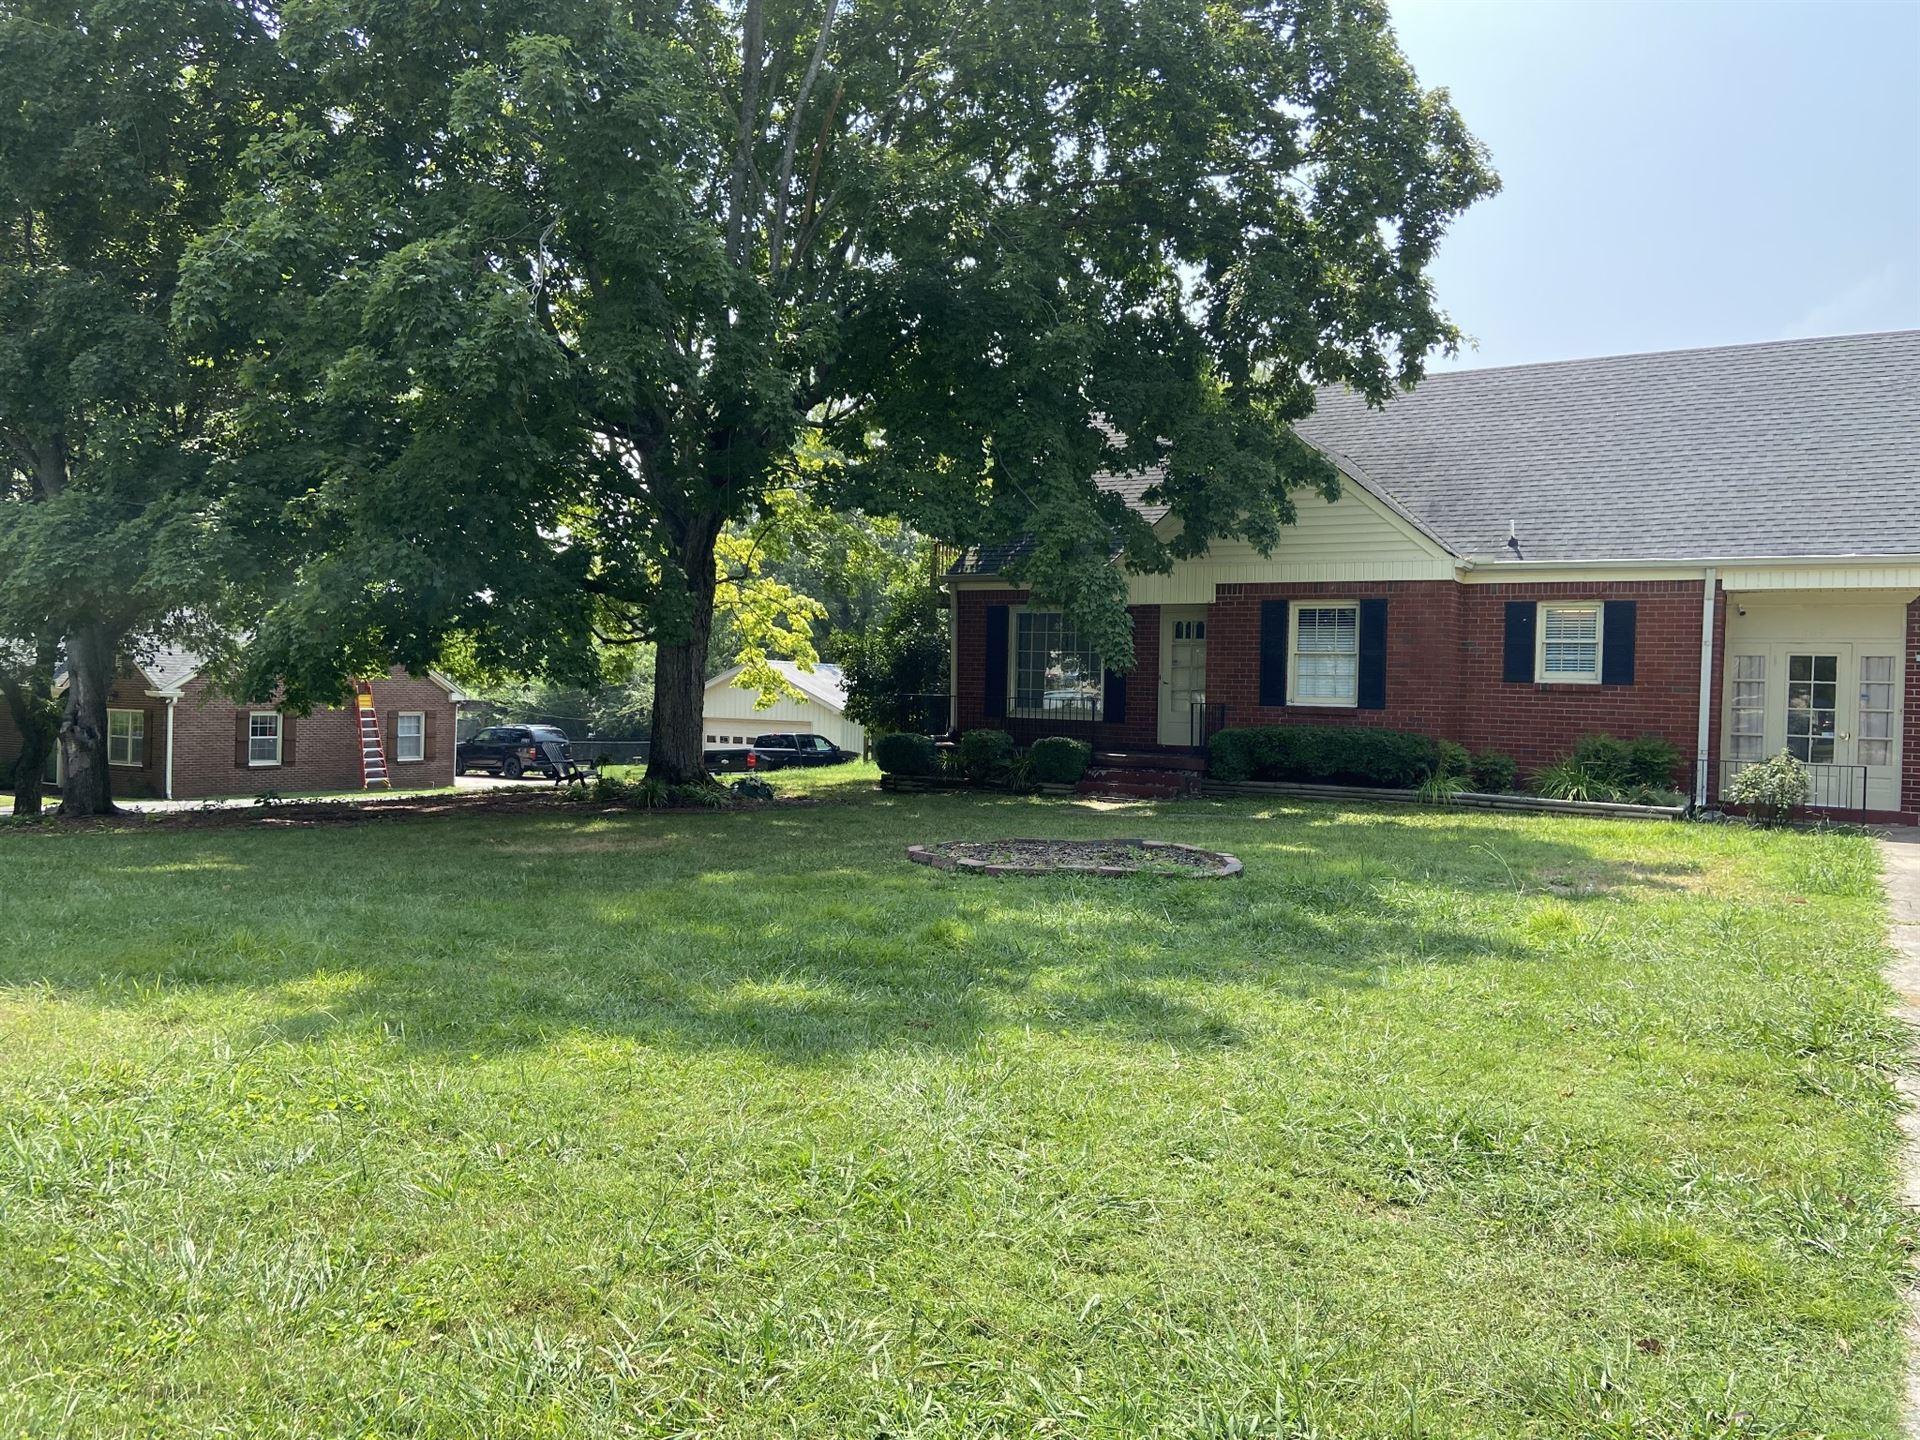 109 Brentlawn Dr, Springfield, TN 37172 - MLS#: 2277856